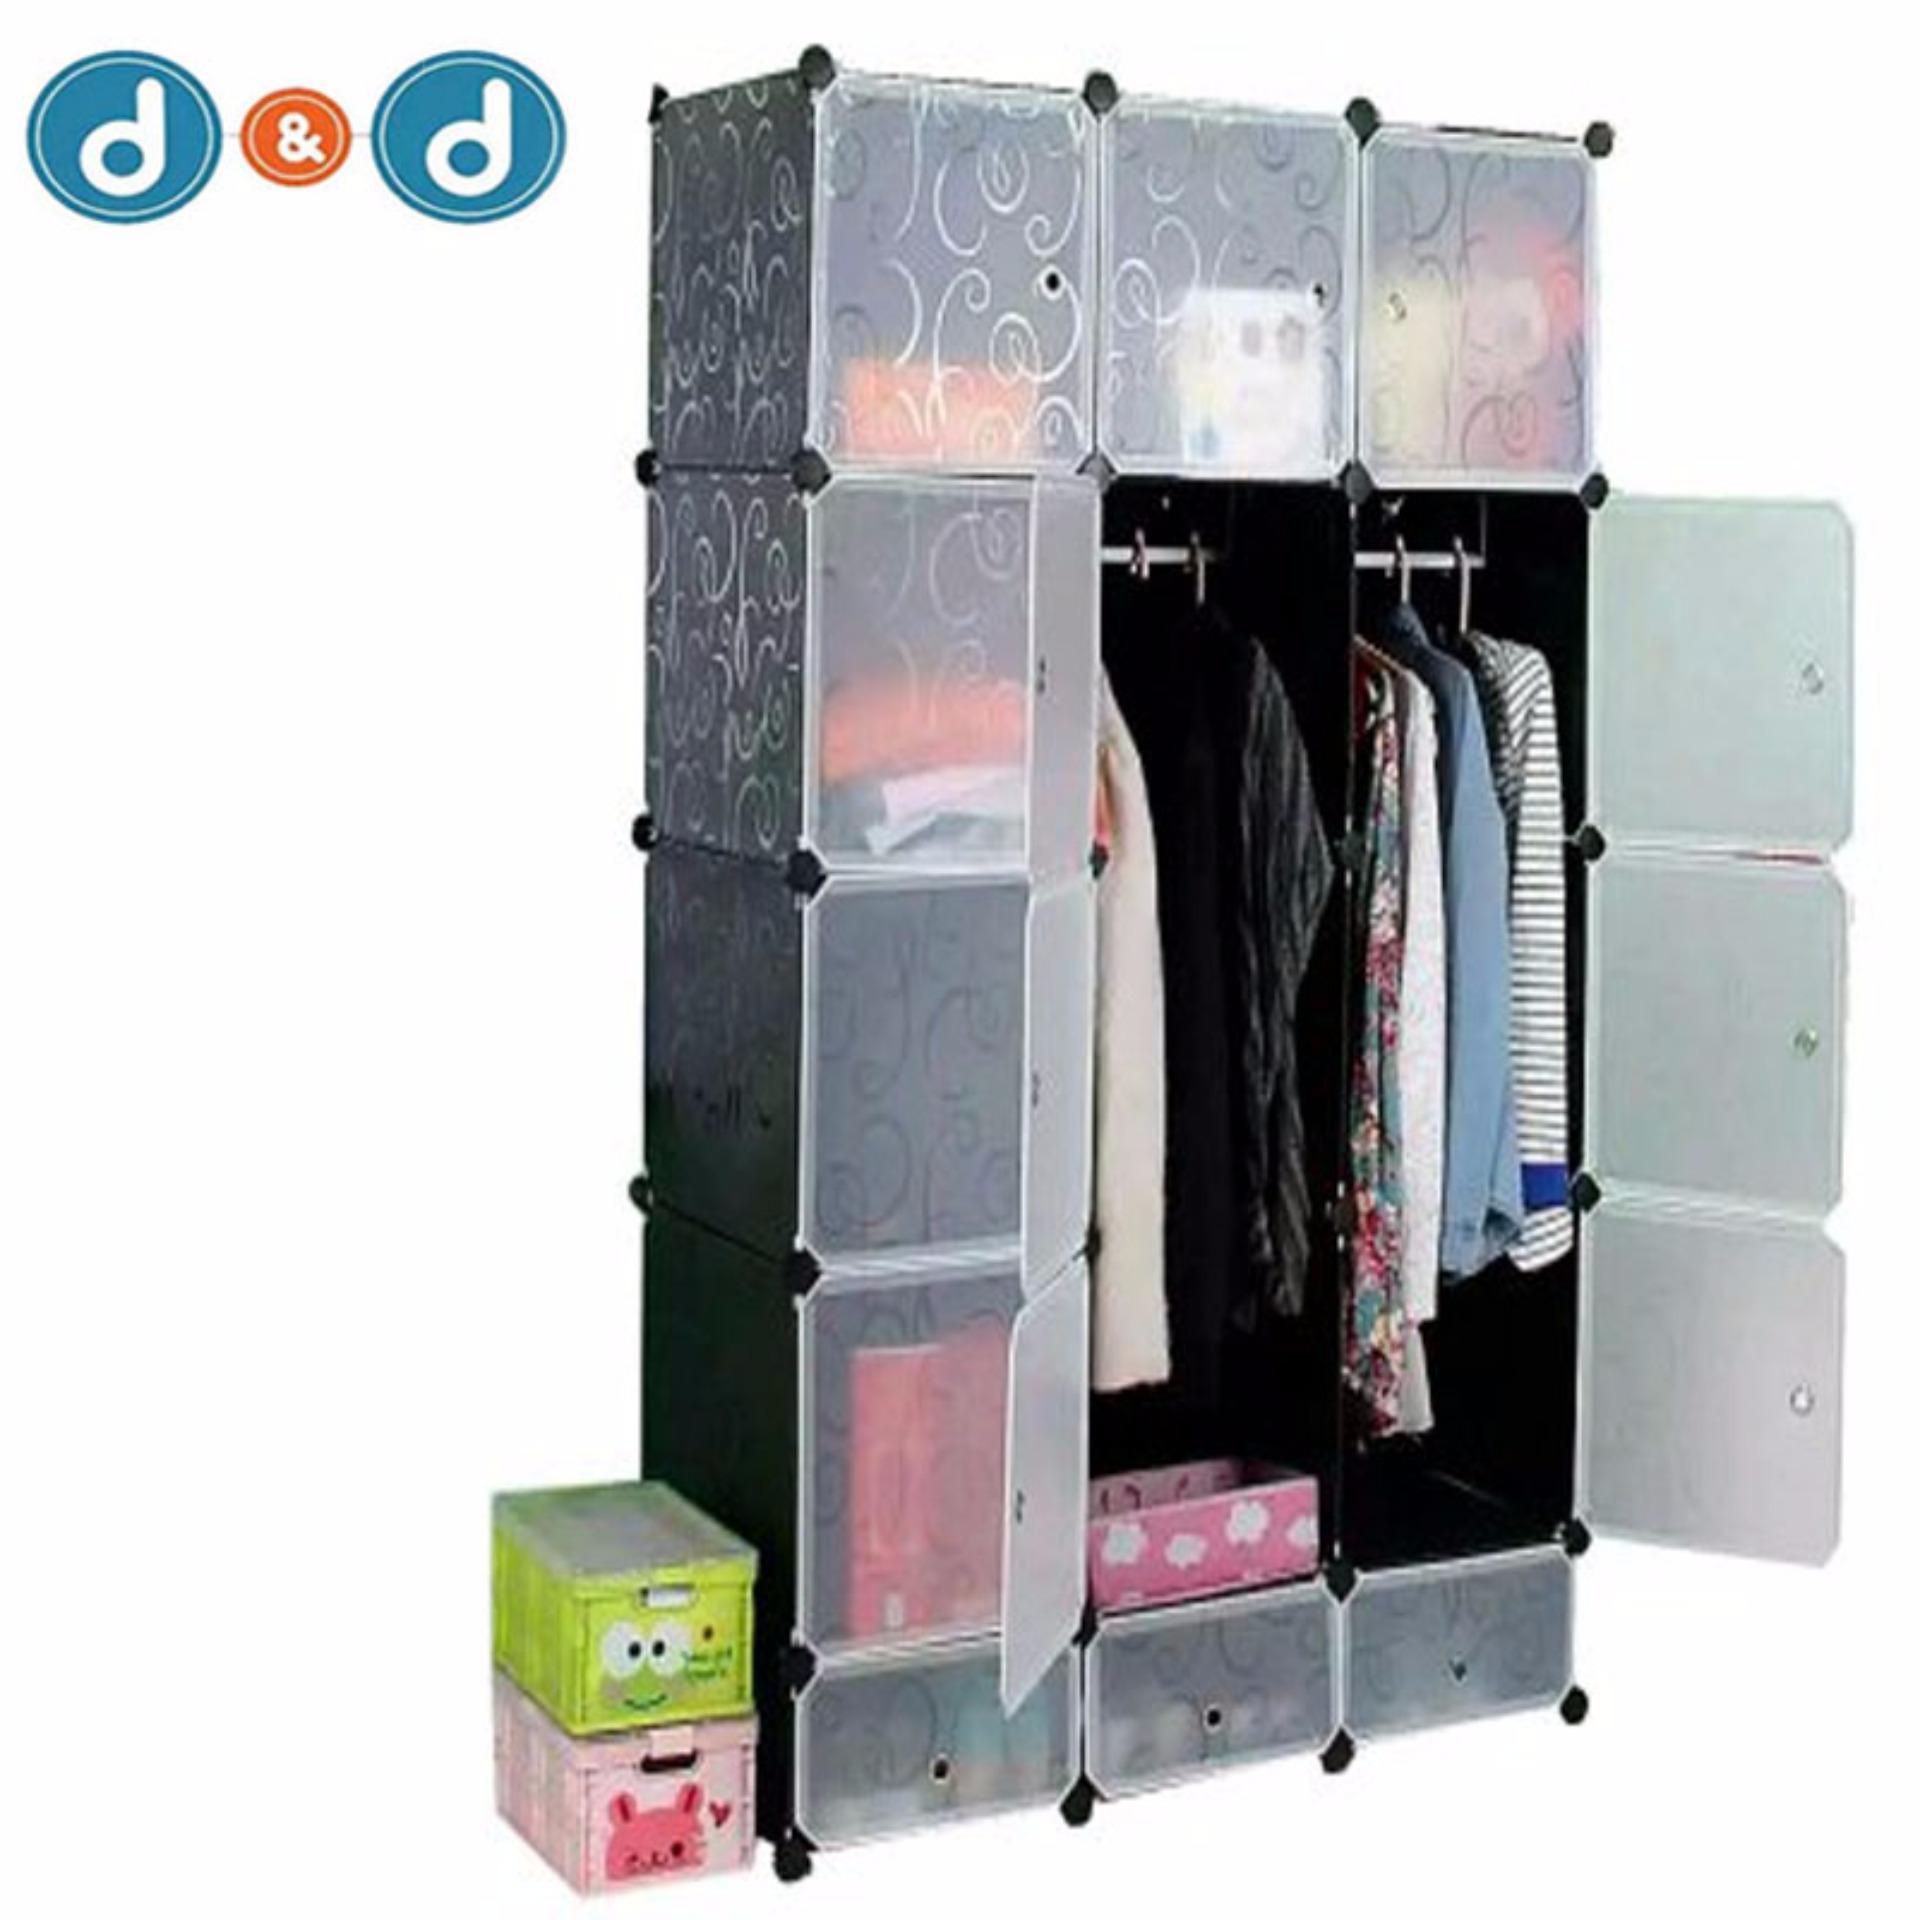 D&D Tupper Cabinet 12 Cubes Full Black DIY Wardrobe | Lazada PH